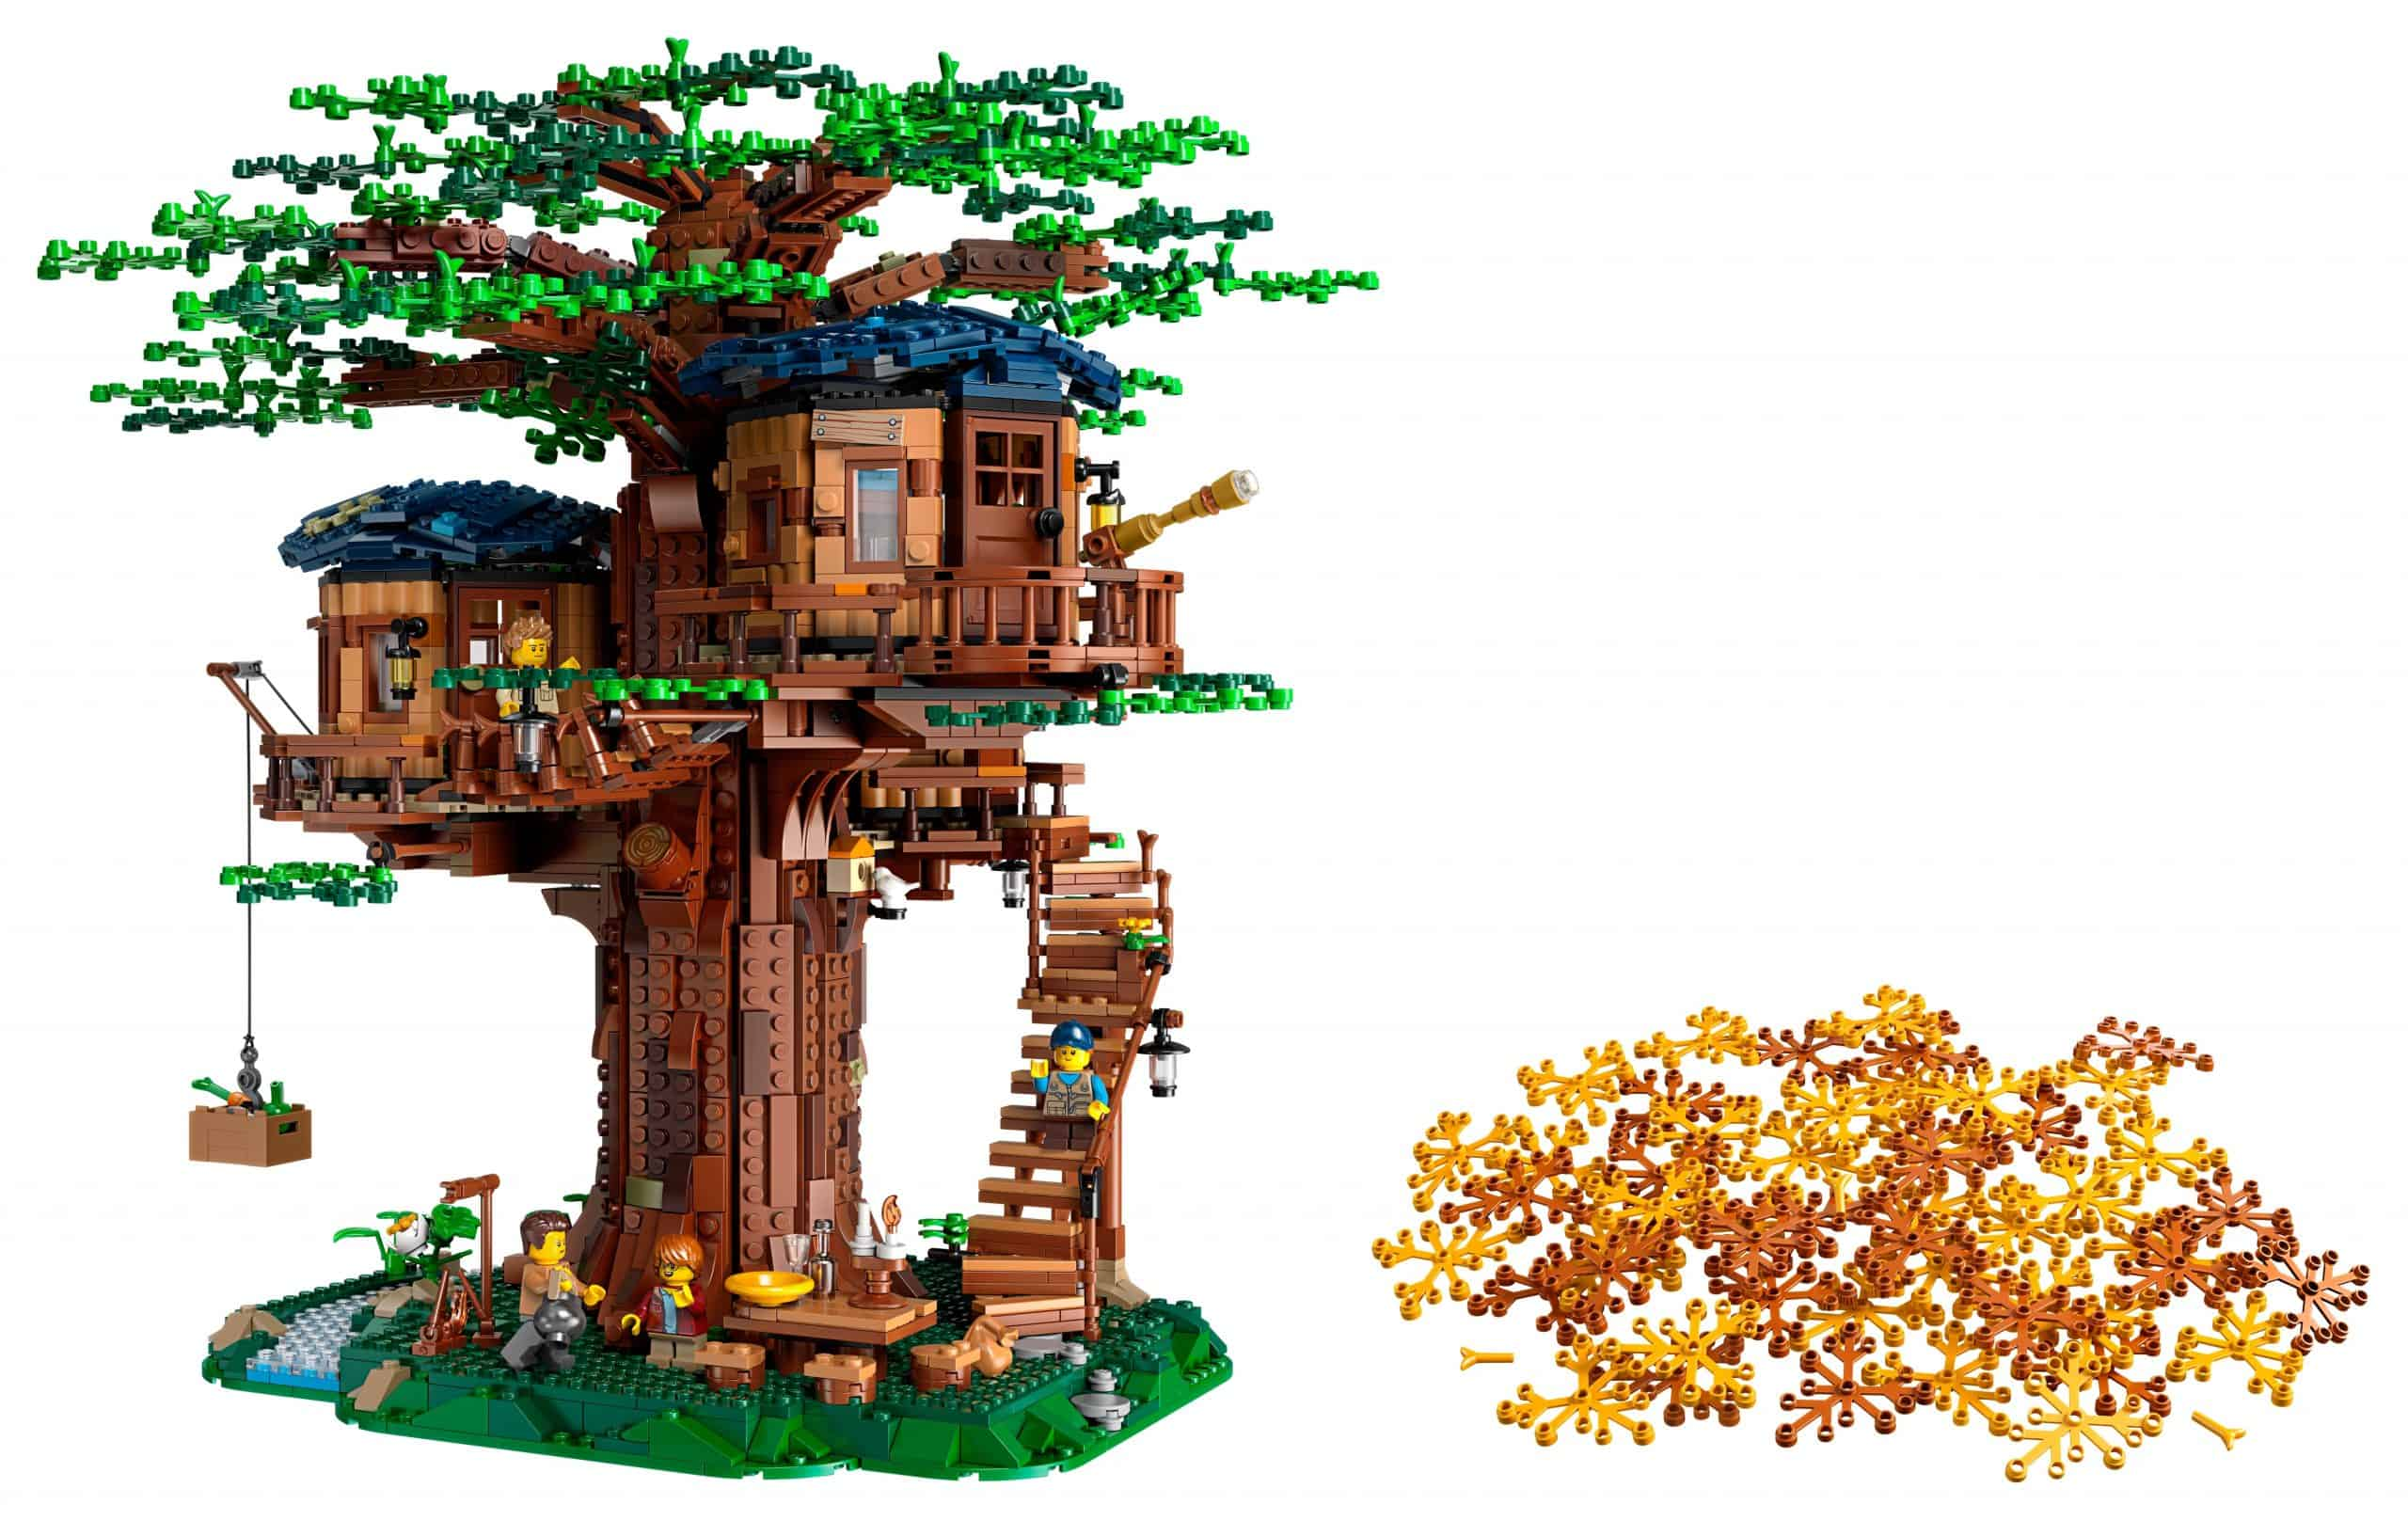 lego boomhut 21318 scaled